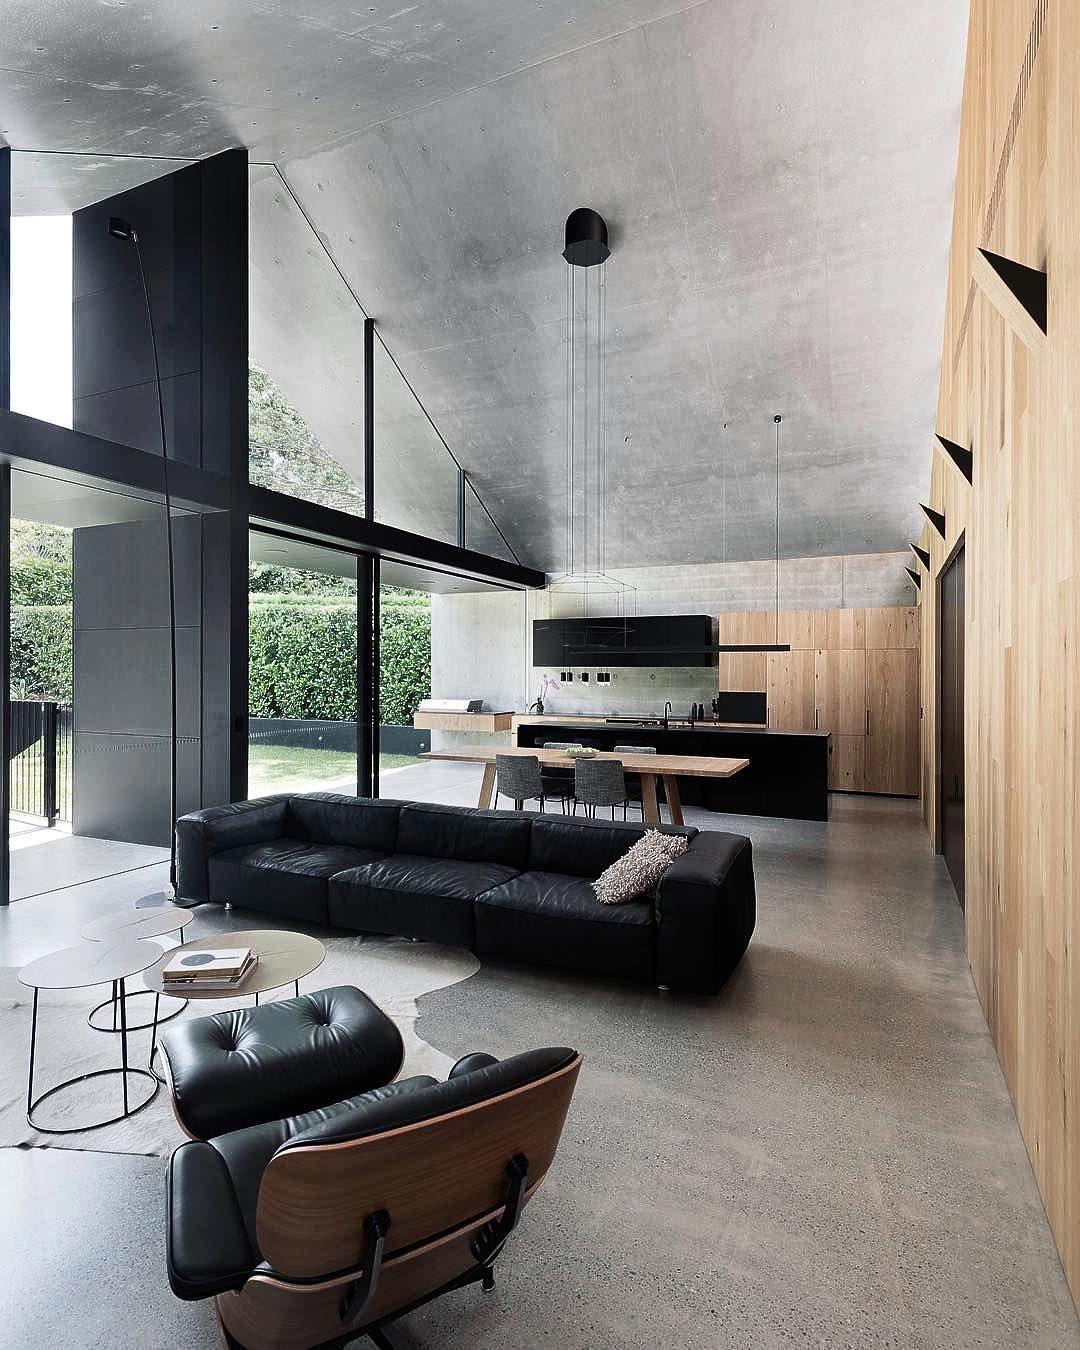 Top Home Decor Blogs Huis Interieur Huis Interieur Design Woonideeen